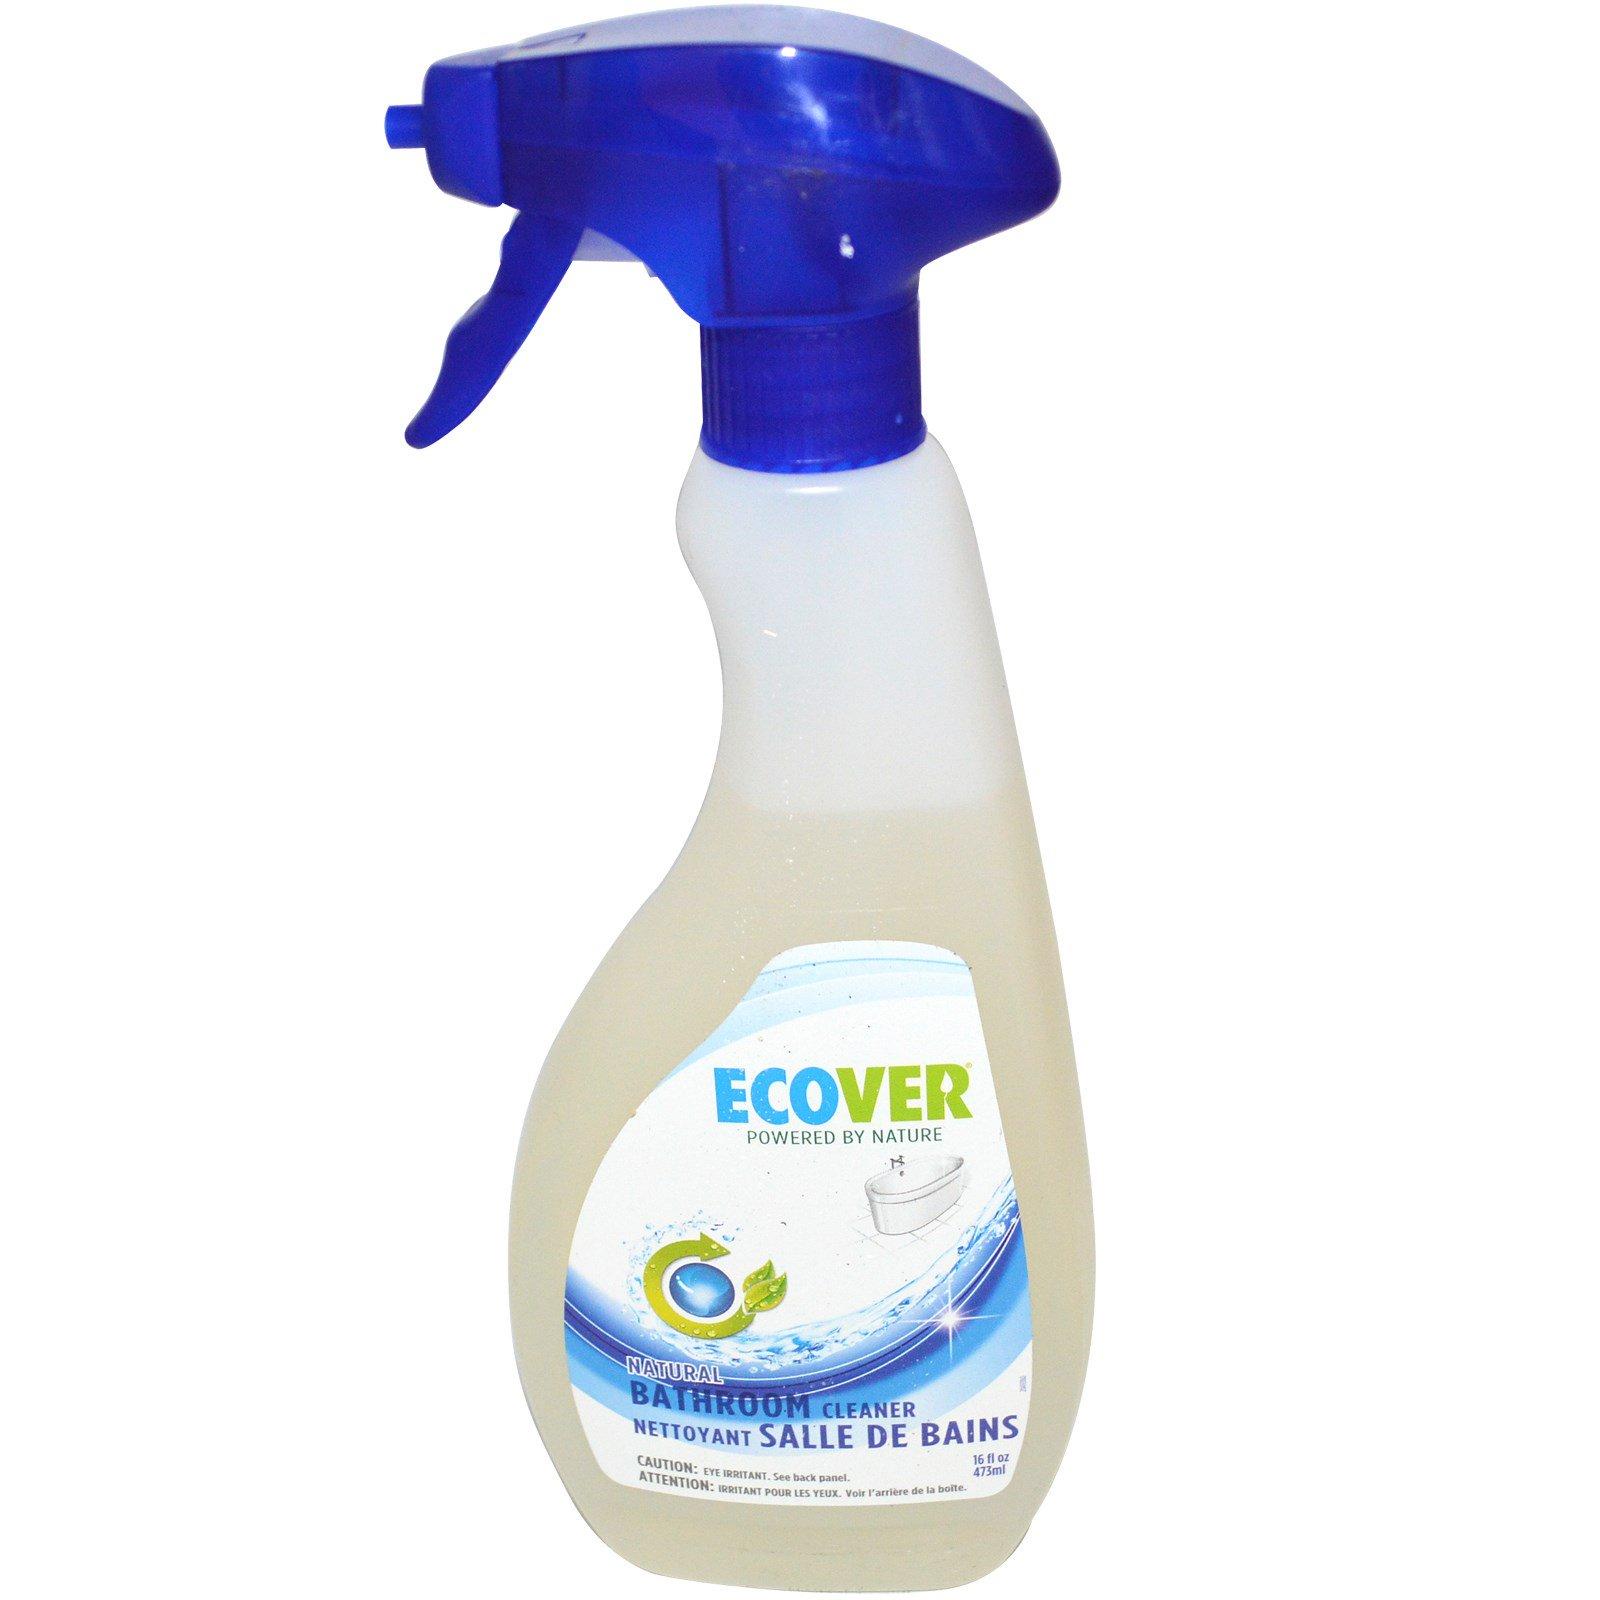 Ecover Natural Bathroom Cleaner Fl Oz Ml IHerbcom - Natural bathroom cleaner